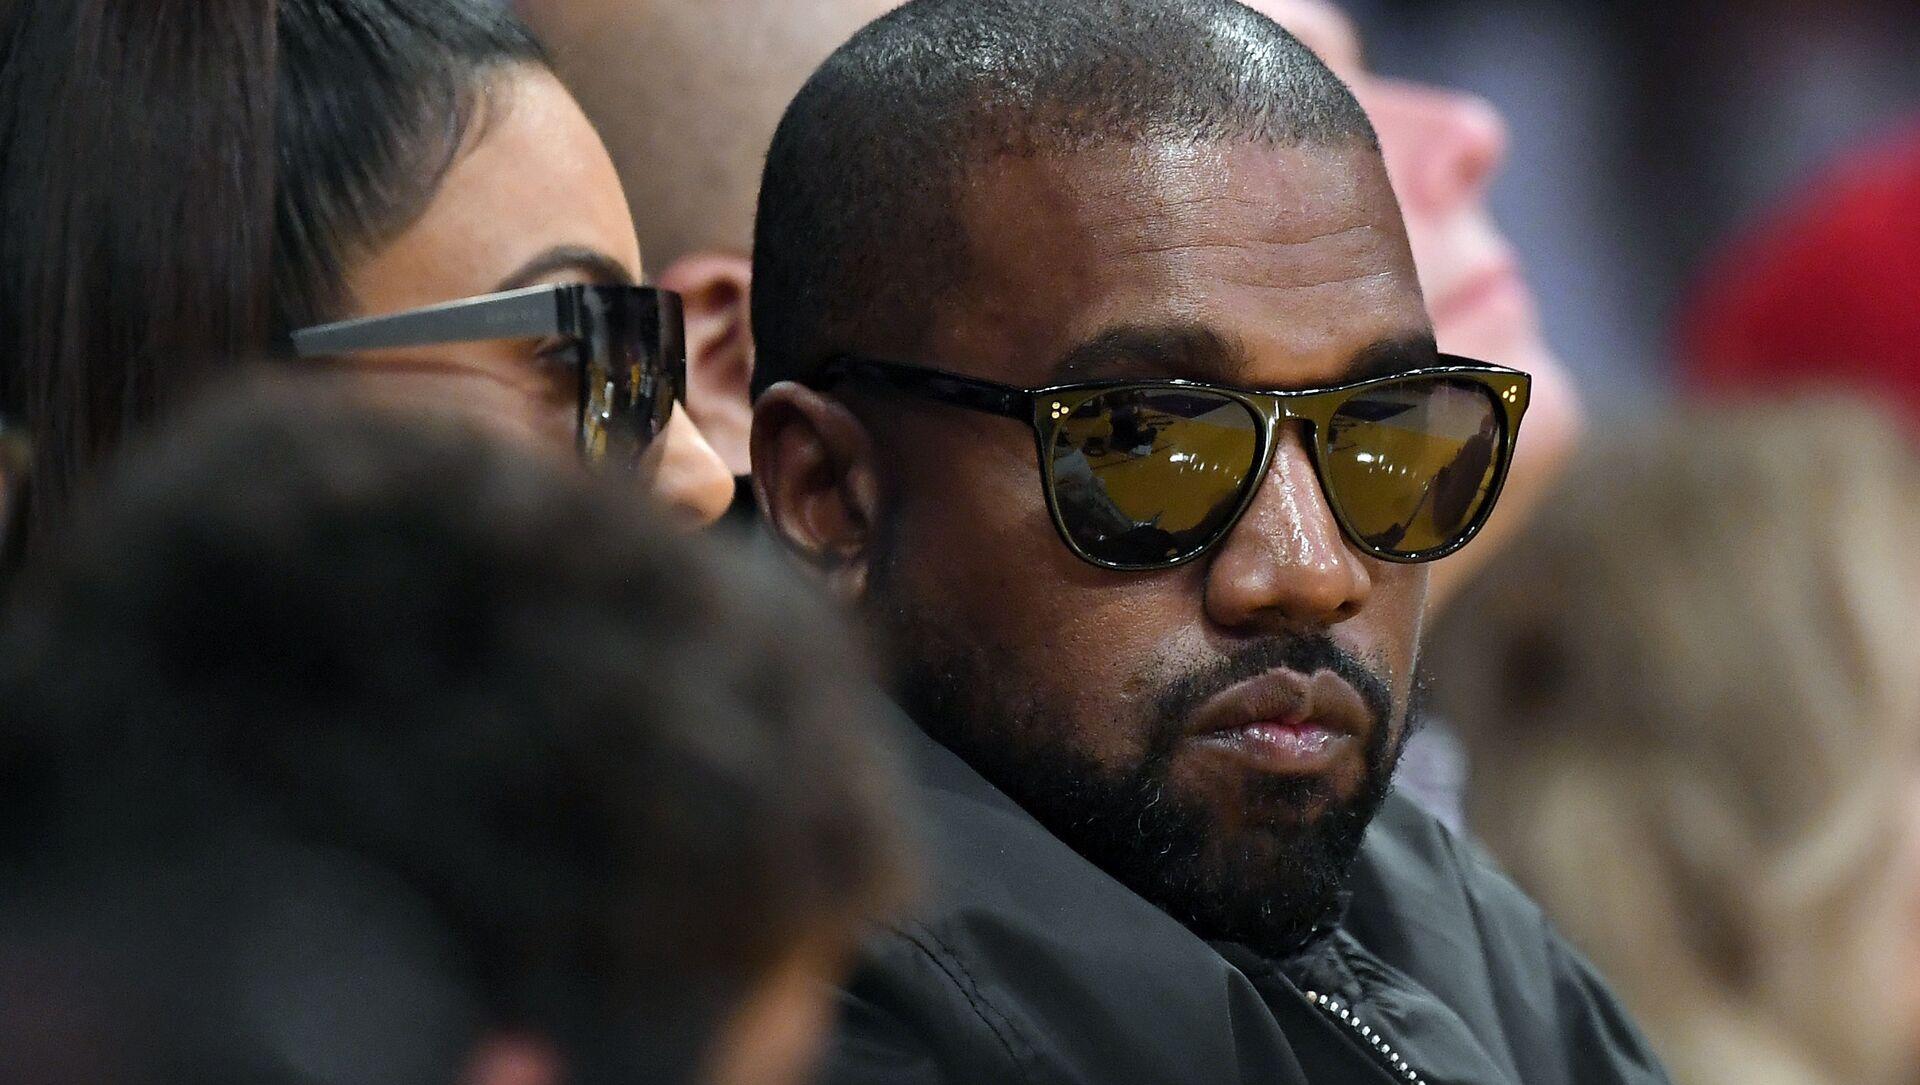 Kim Kardashian e il rapper Kanye West - Sputnik Italia, 1920, 11.03.2021